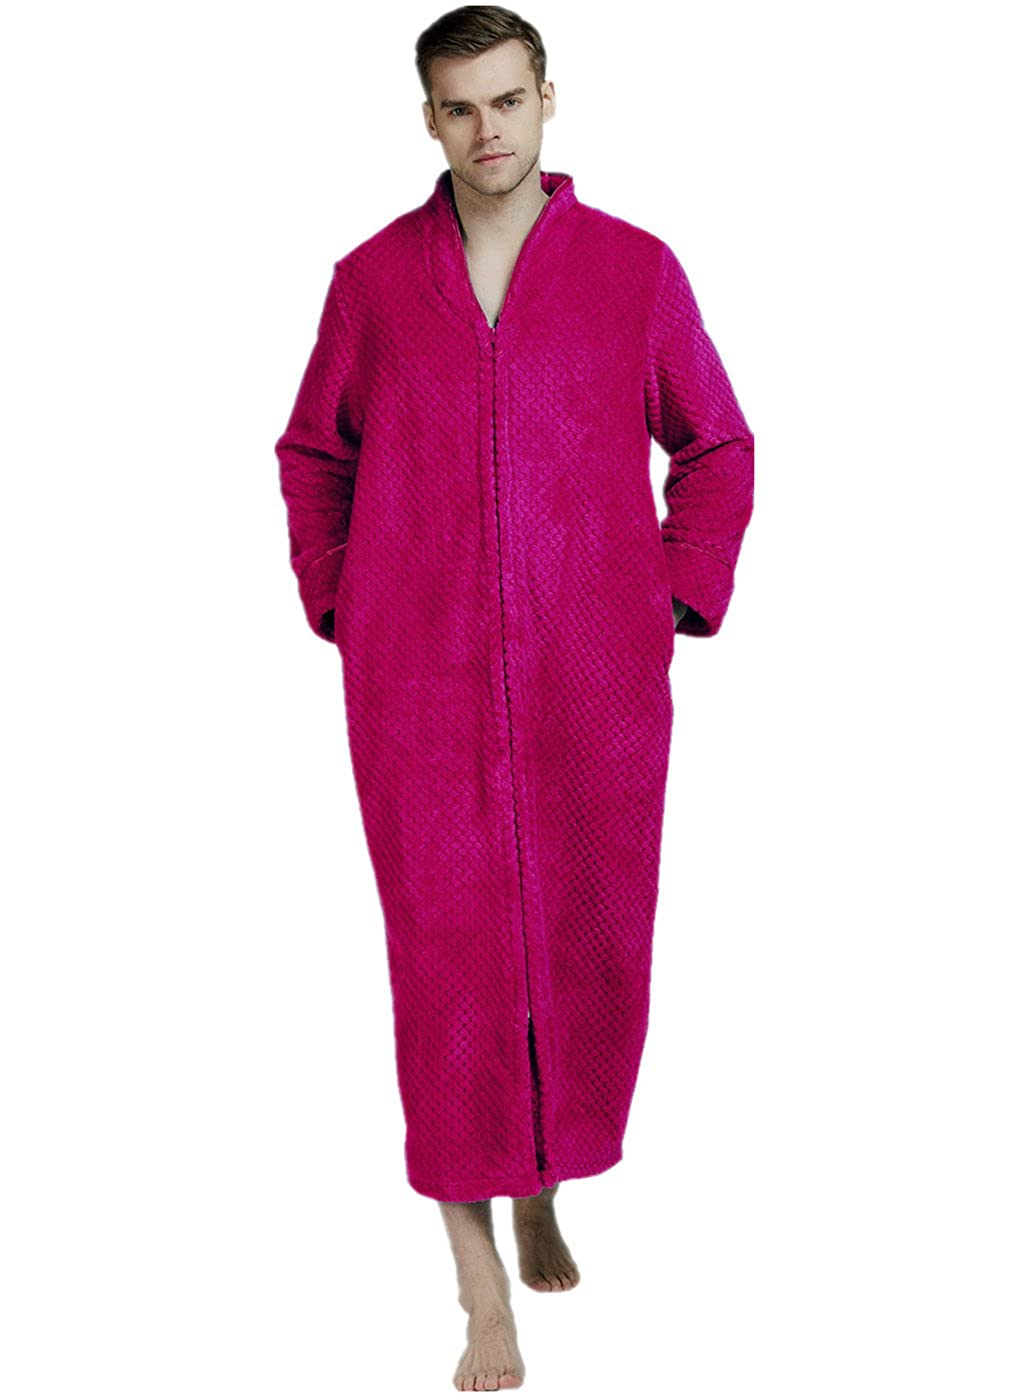 Soft Zip-Front Bathrobe Full Length Long Sleeve Sleepwear Spa Bathrobe VERNASSA Mens Fleece Robe